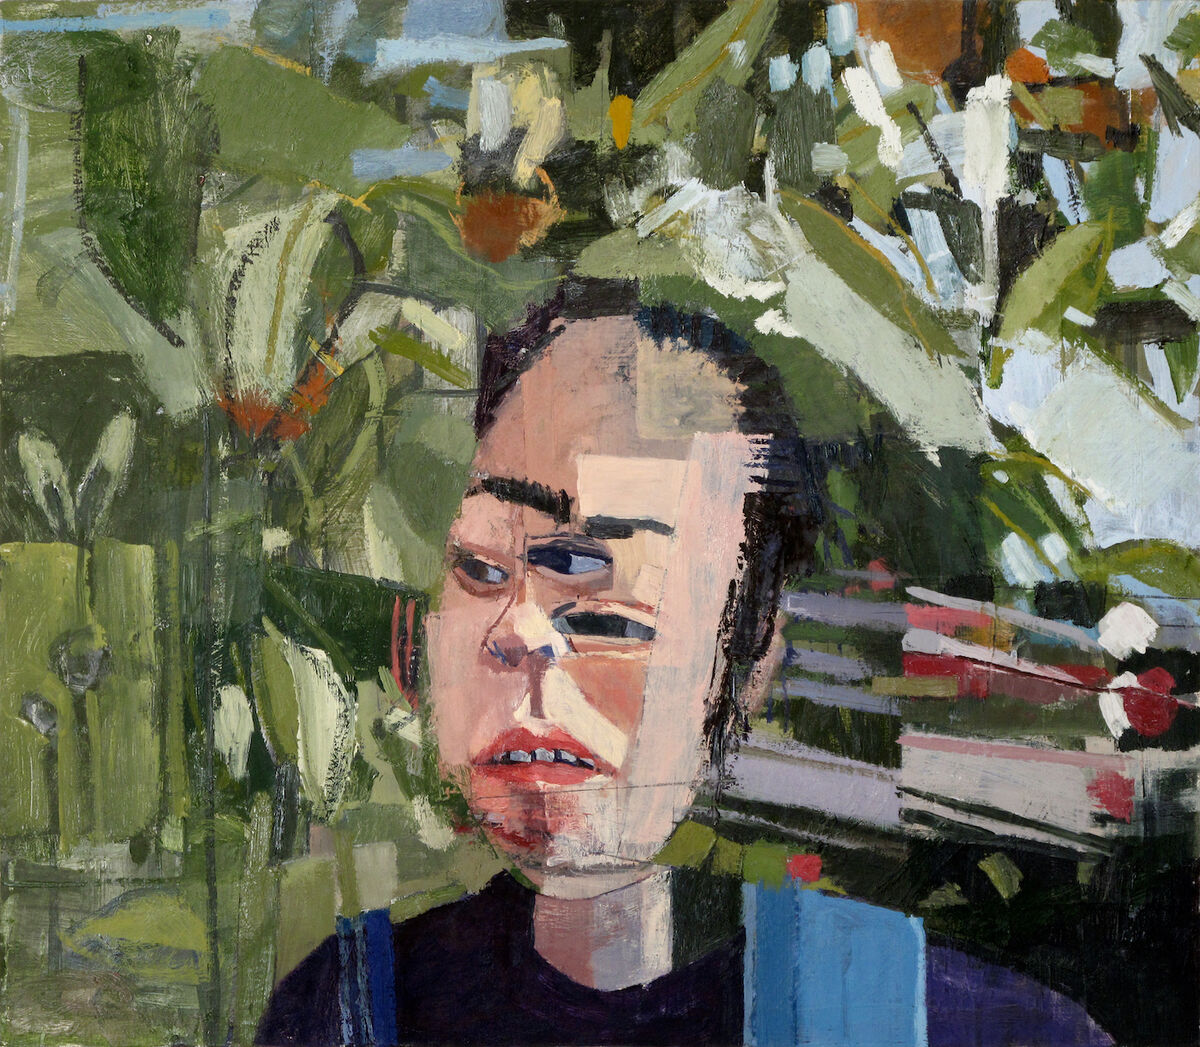 Left-handed paintings. Jonas Wood, Shio with Three Eyes, 2002. © Jonas Wood. Courtesy of the artist.